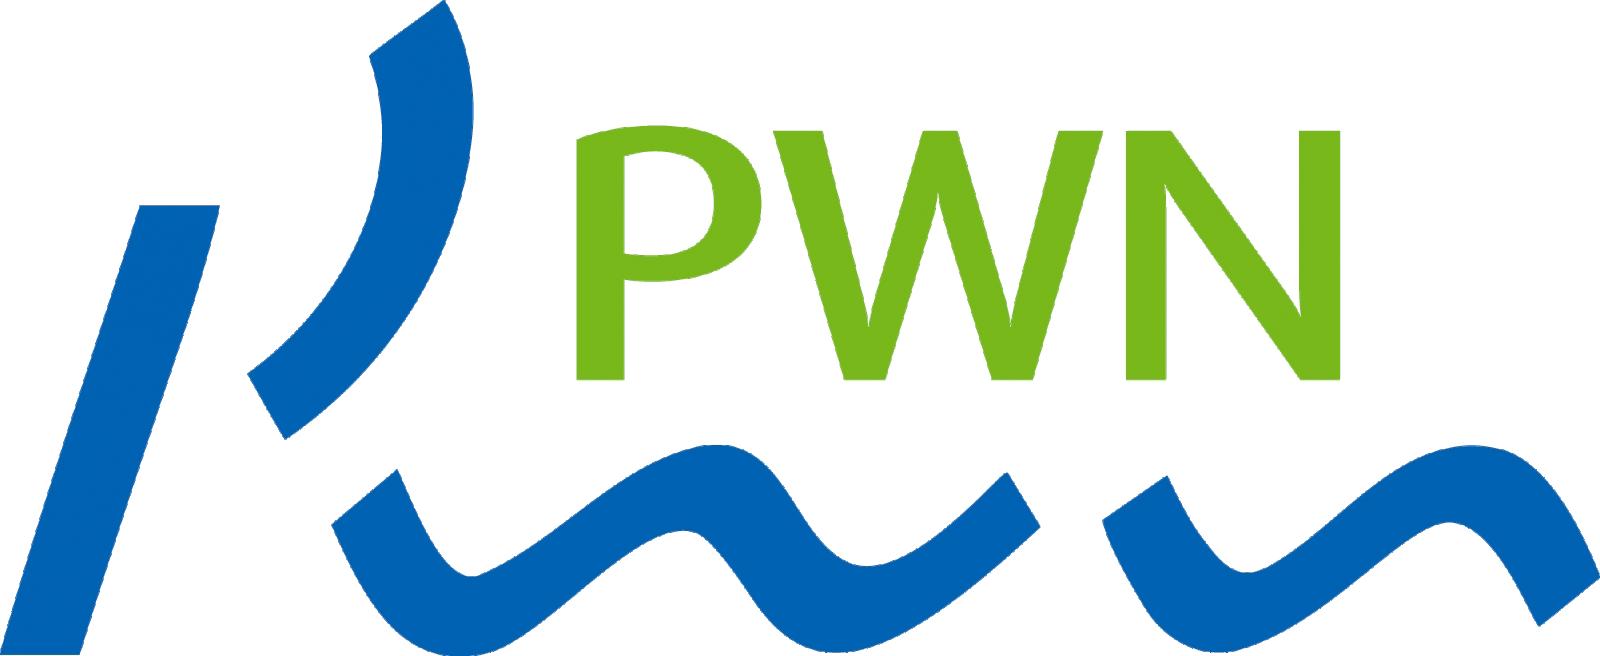 https://www.waterforlife.nl/files/visuals/_1600x900_fit_center-center_85_none/Logo_PWN_2012_zonder-achtergrond_2021-01-26-140358.png